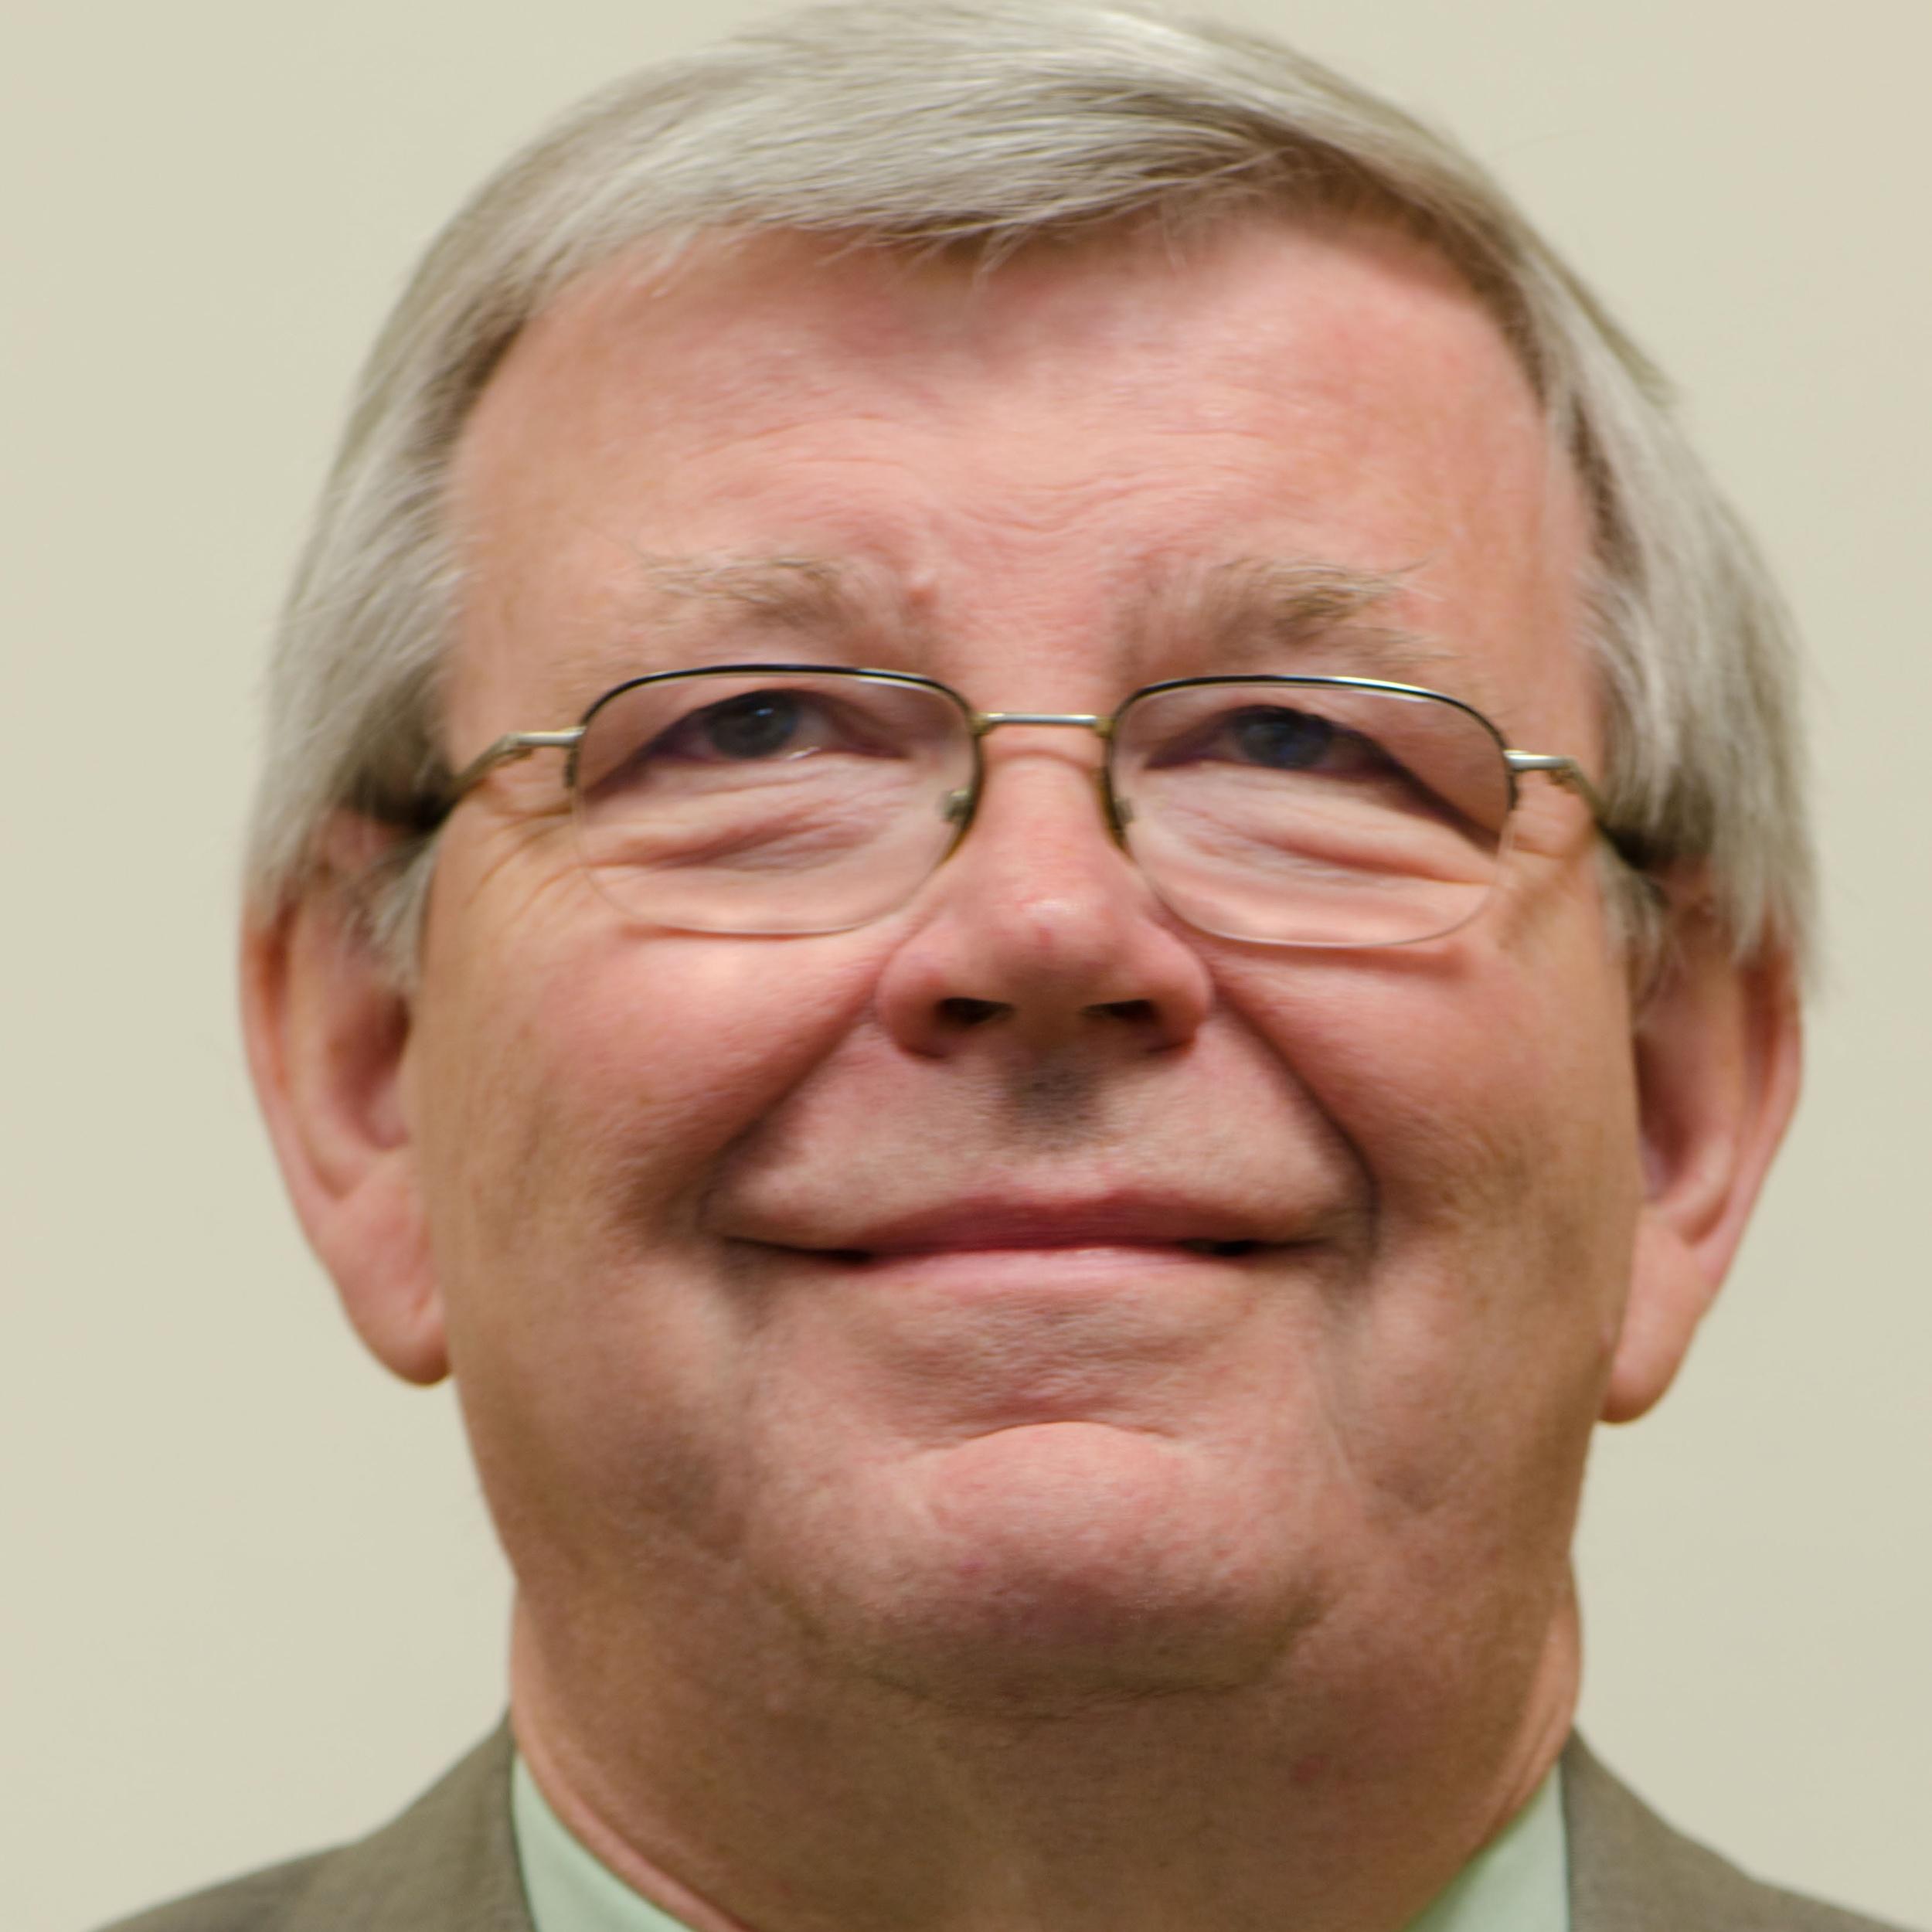 Phil Mount